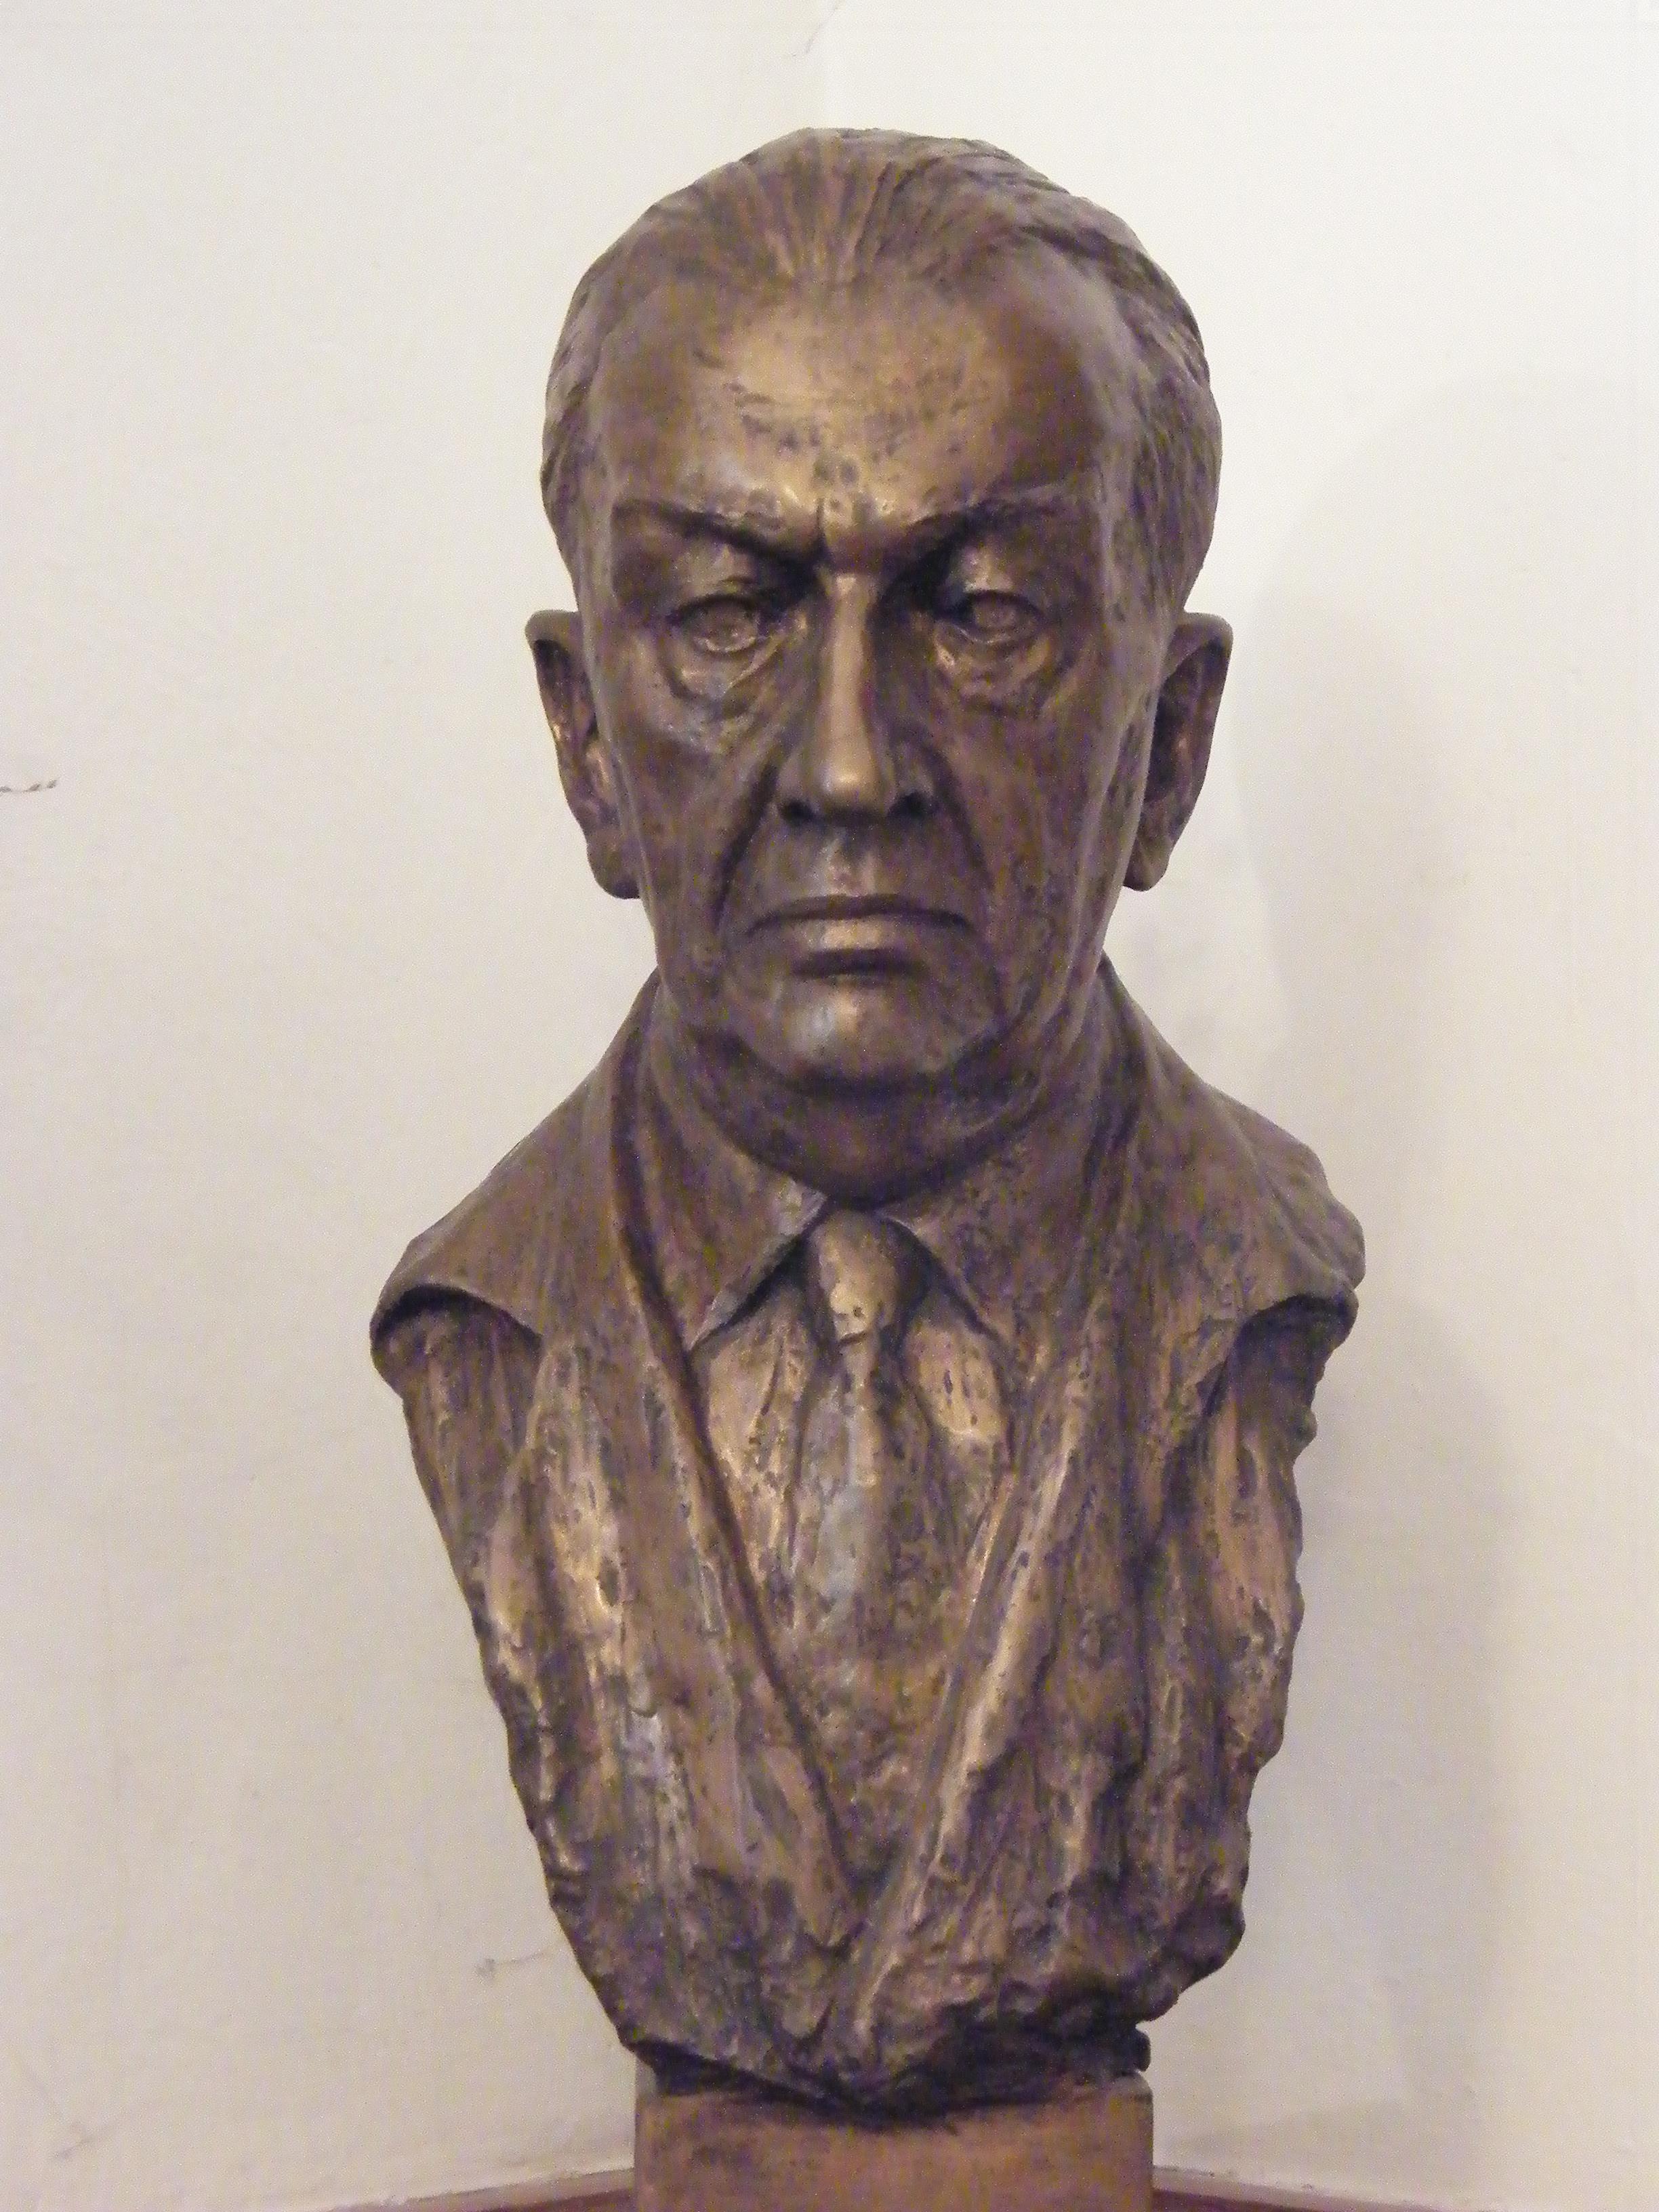 Busta prof. Josefa Charváta od akad. sochařky Zdenky Štěpánové. Foto: Petr Sucharda